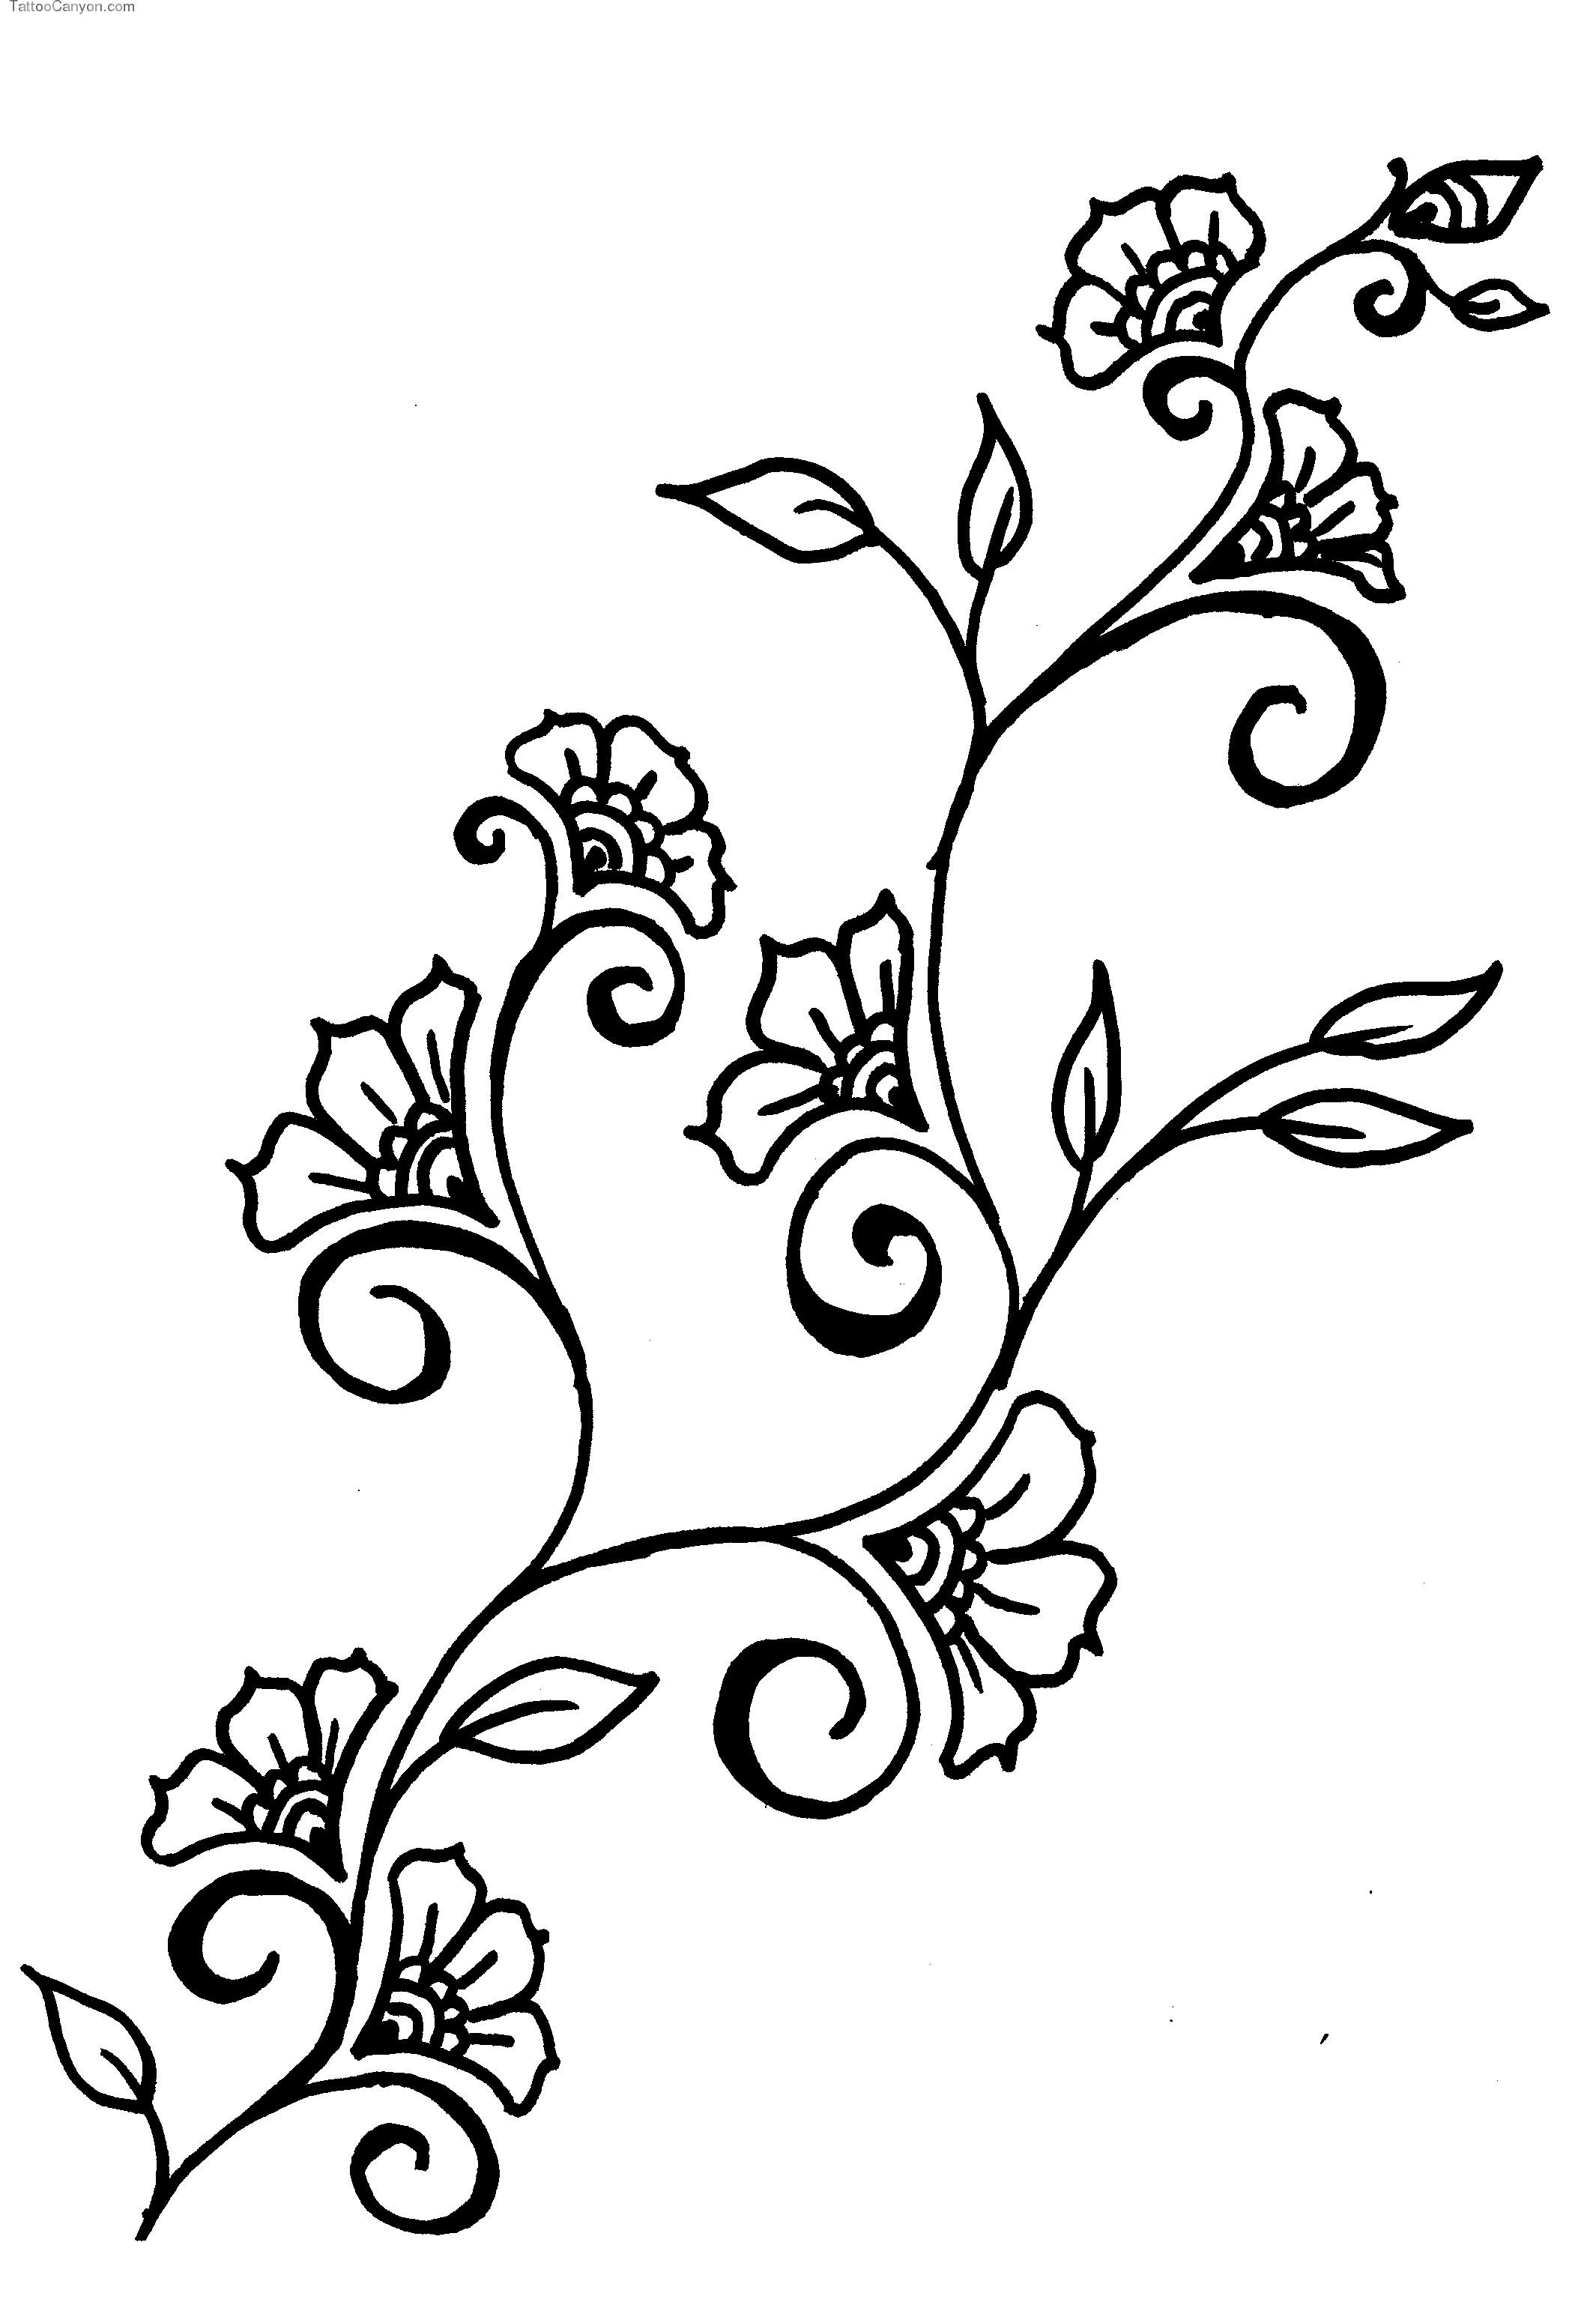 Drawn ivy branch Design Design Vines ClipArt Flowers